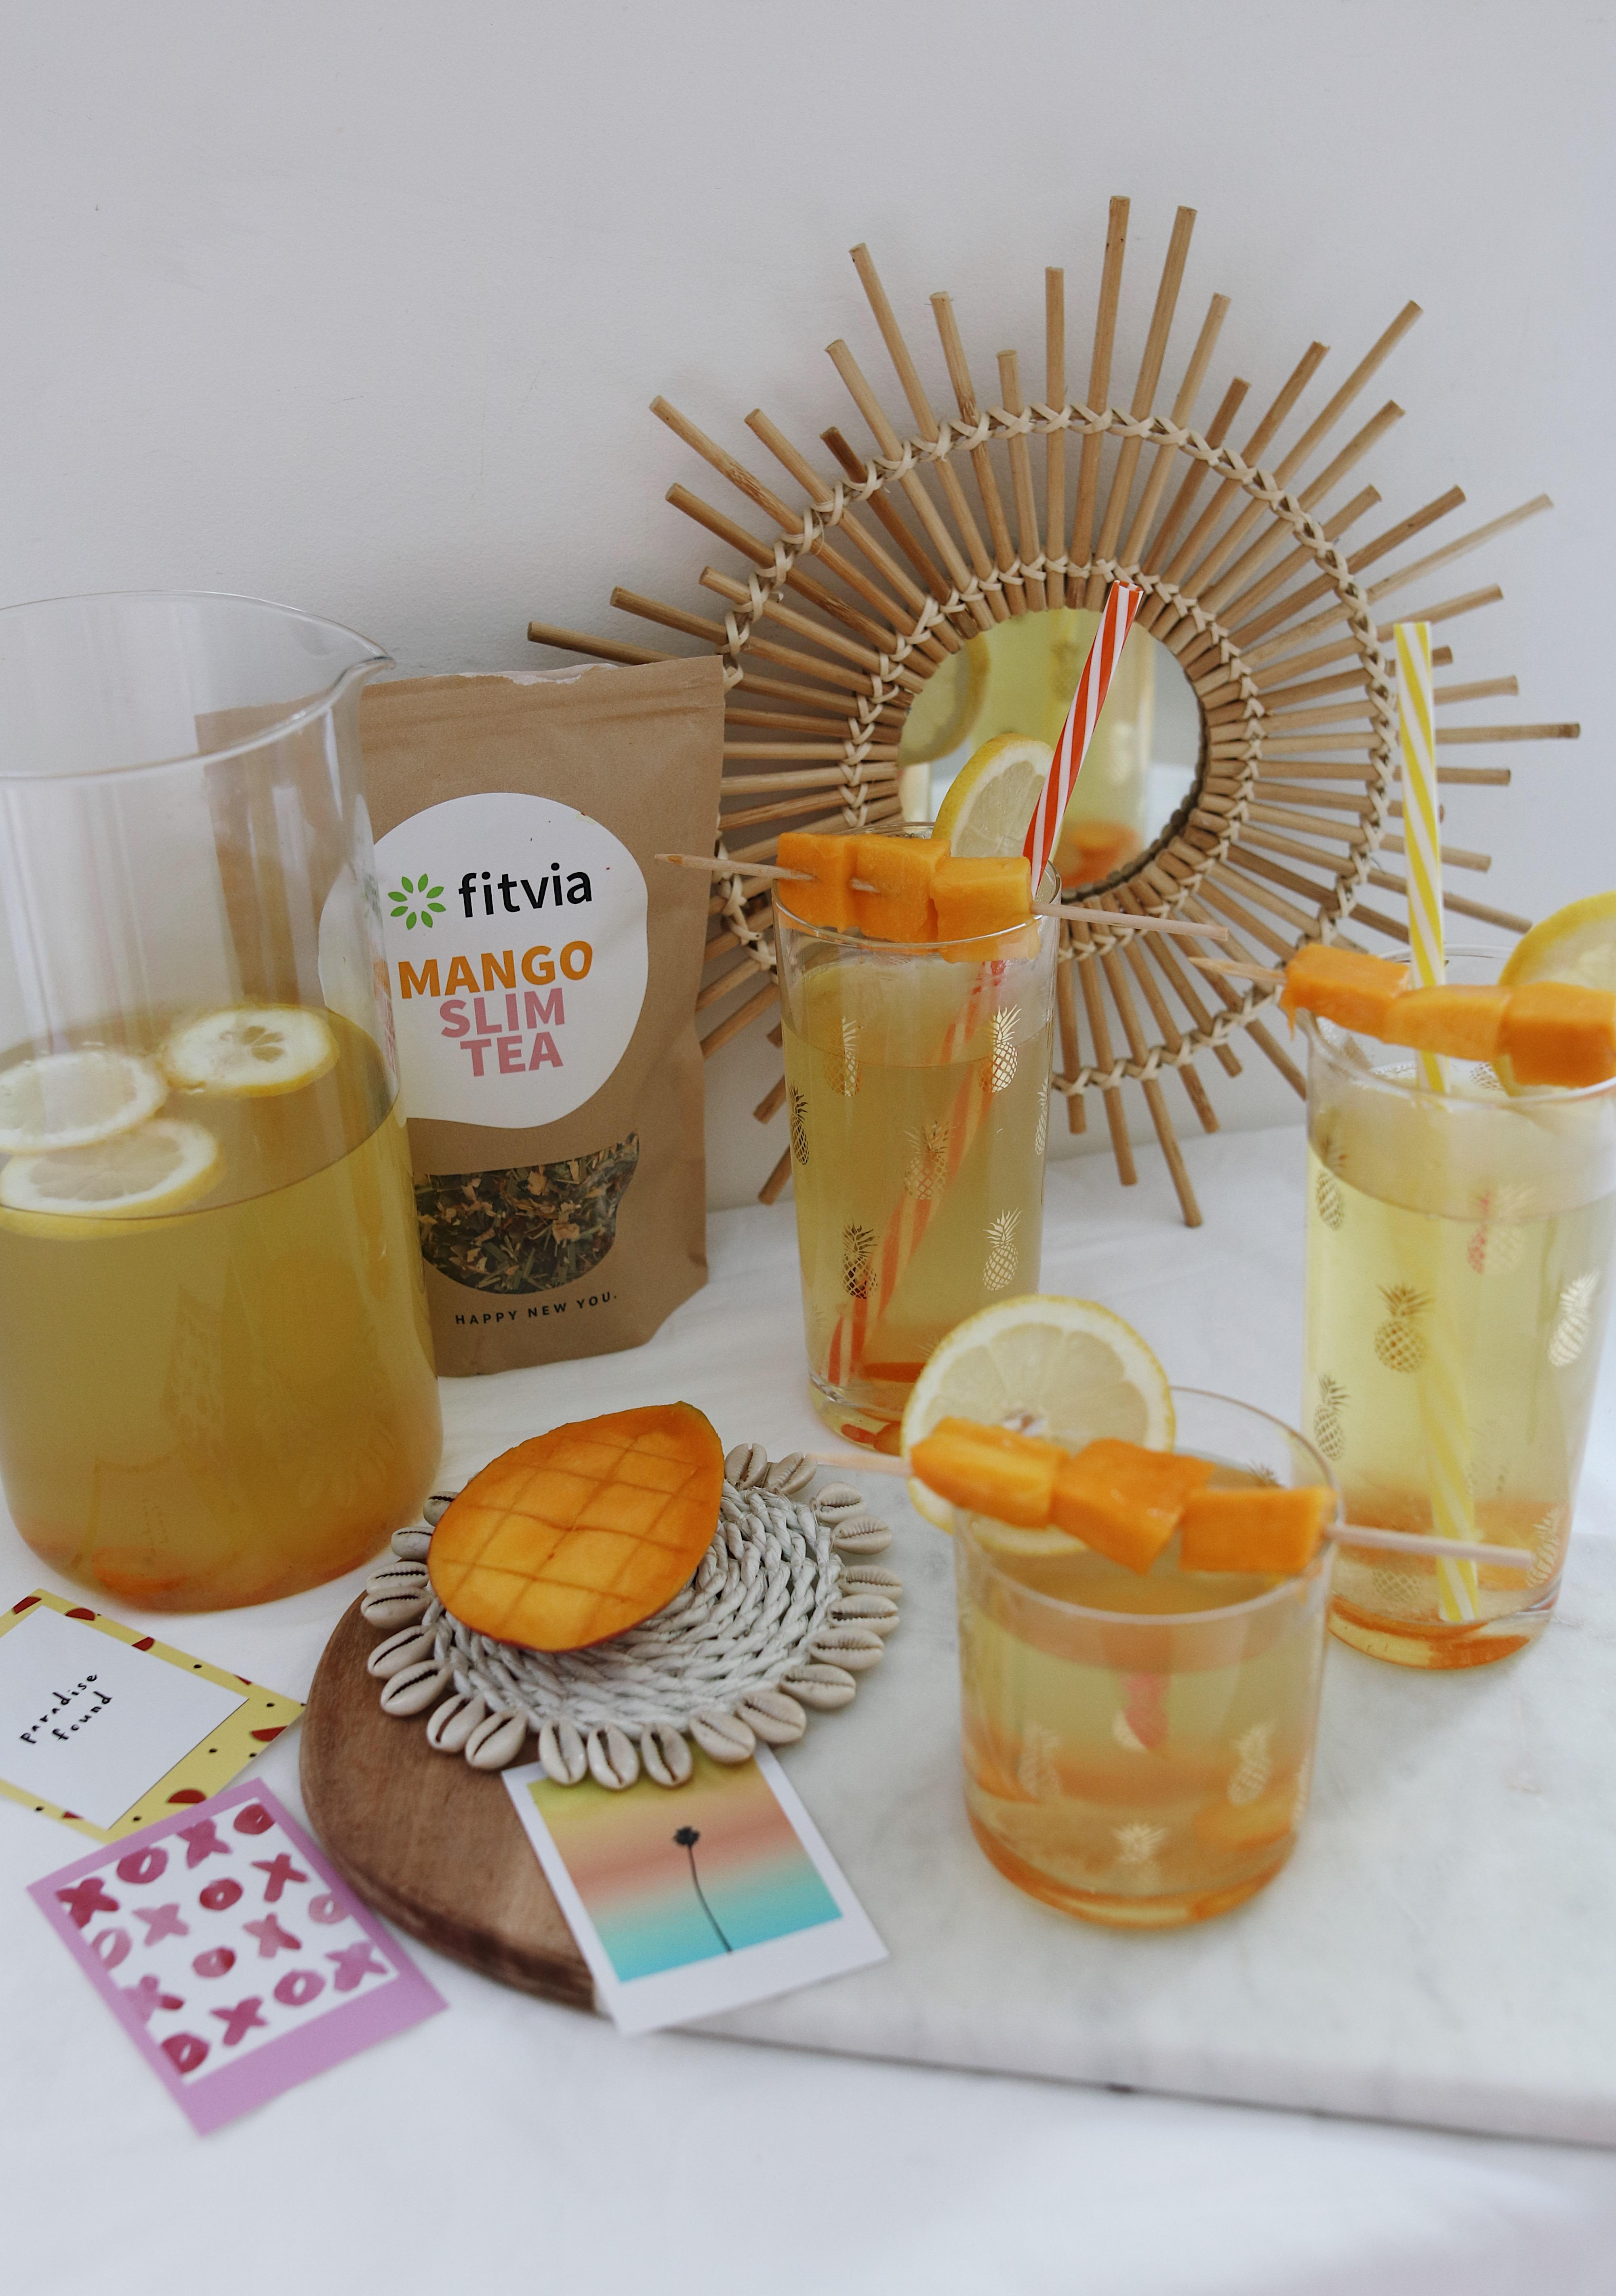 @chon.and.chon MANGO DETOX ICED TEA - thé fitvia- healthy iced tea www.chonandhon.com - thé glacé mangue detox